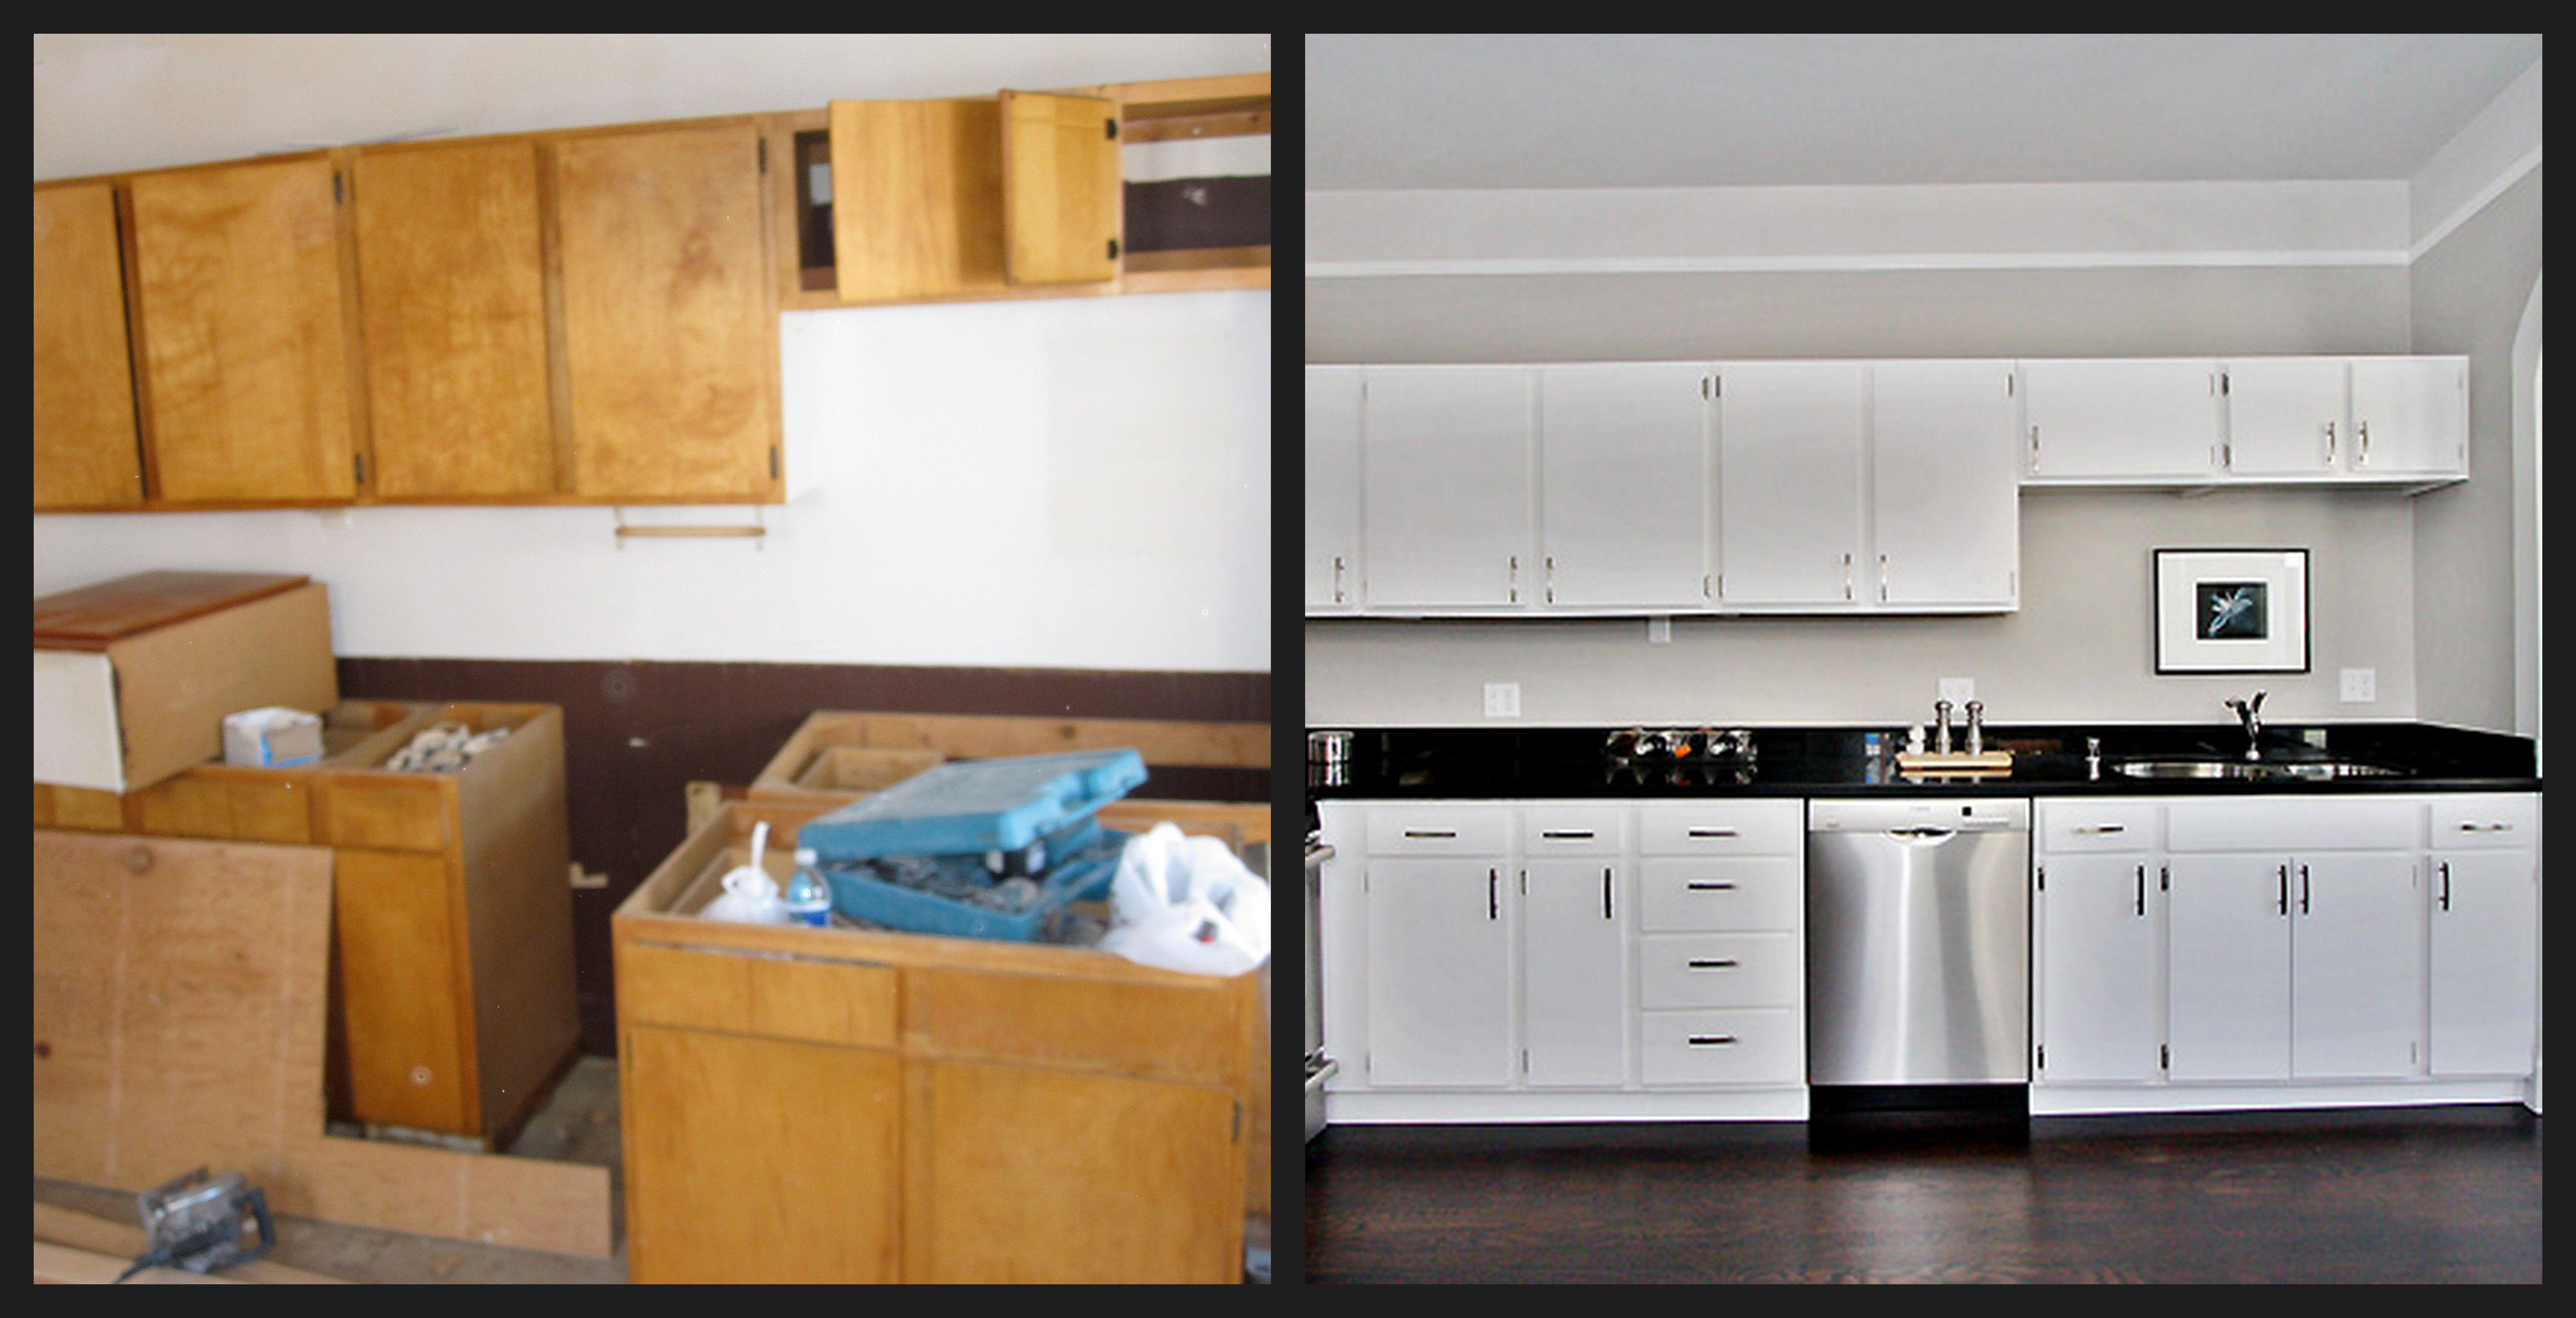 Cabinet Painting Kitchen Cabinet Refinishing Remodeling Mobile Homes Mobile Home Kitchen Home Remodeling